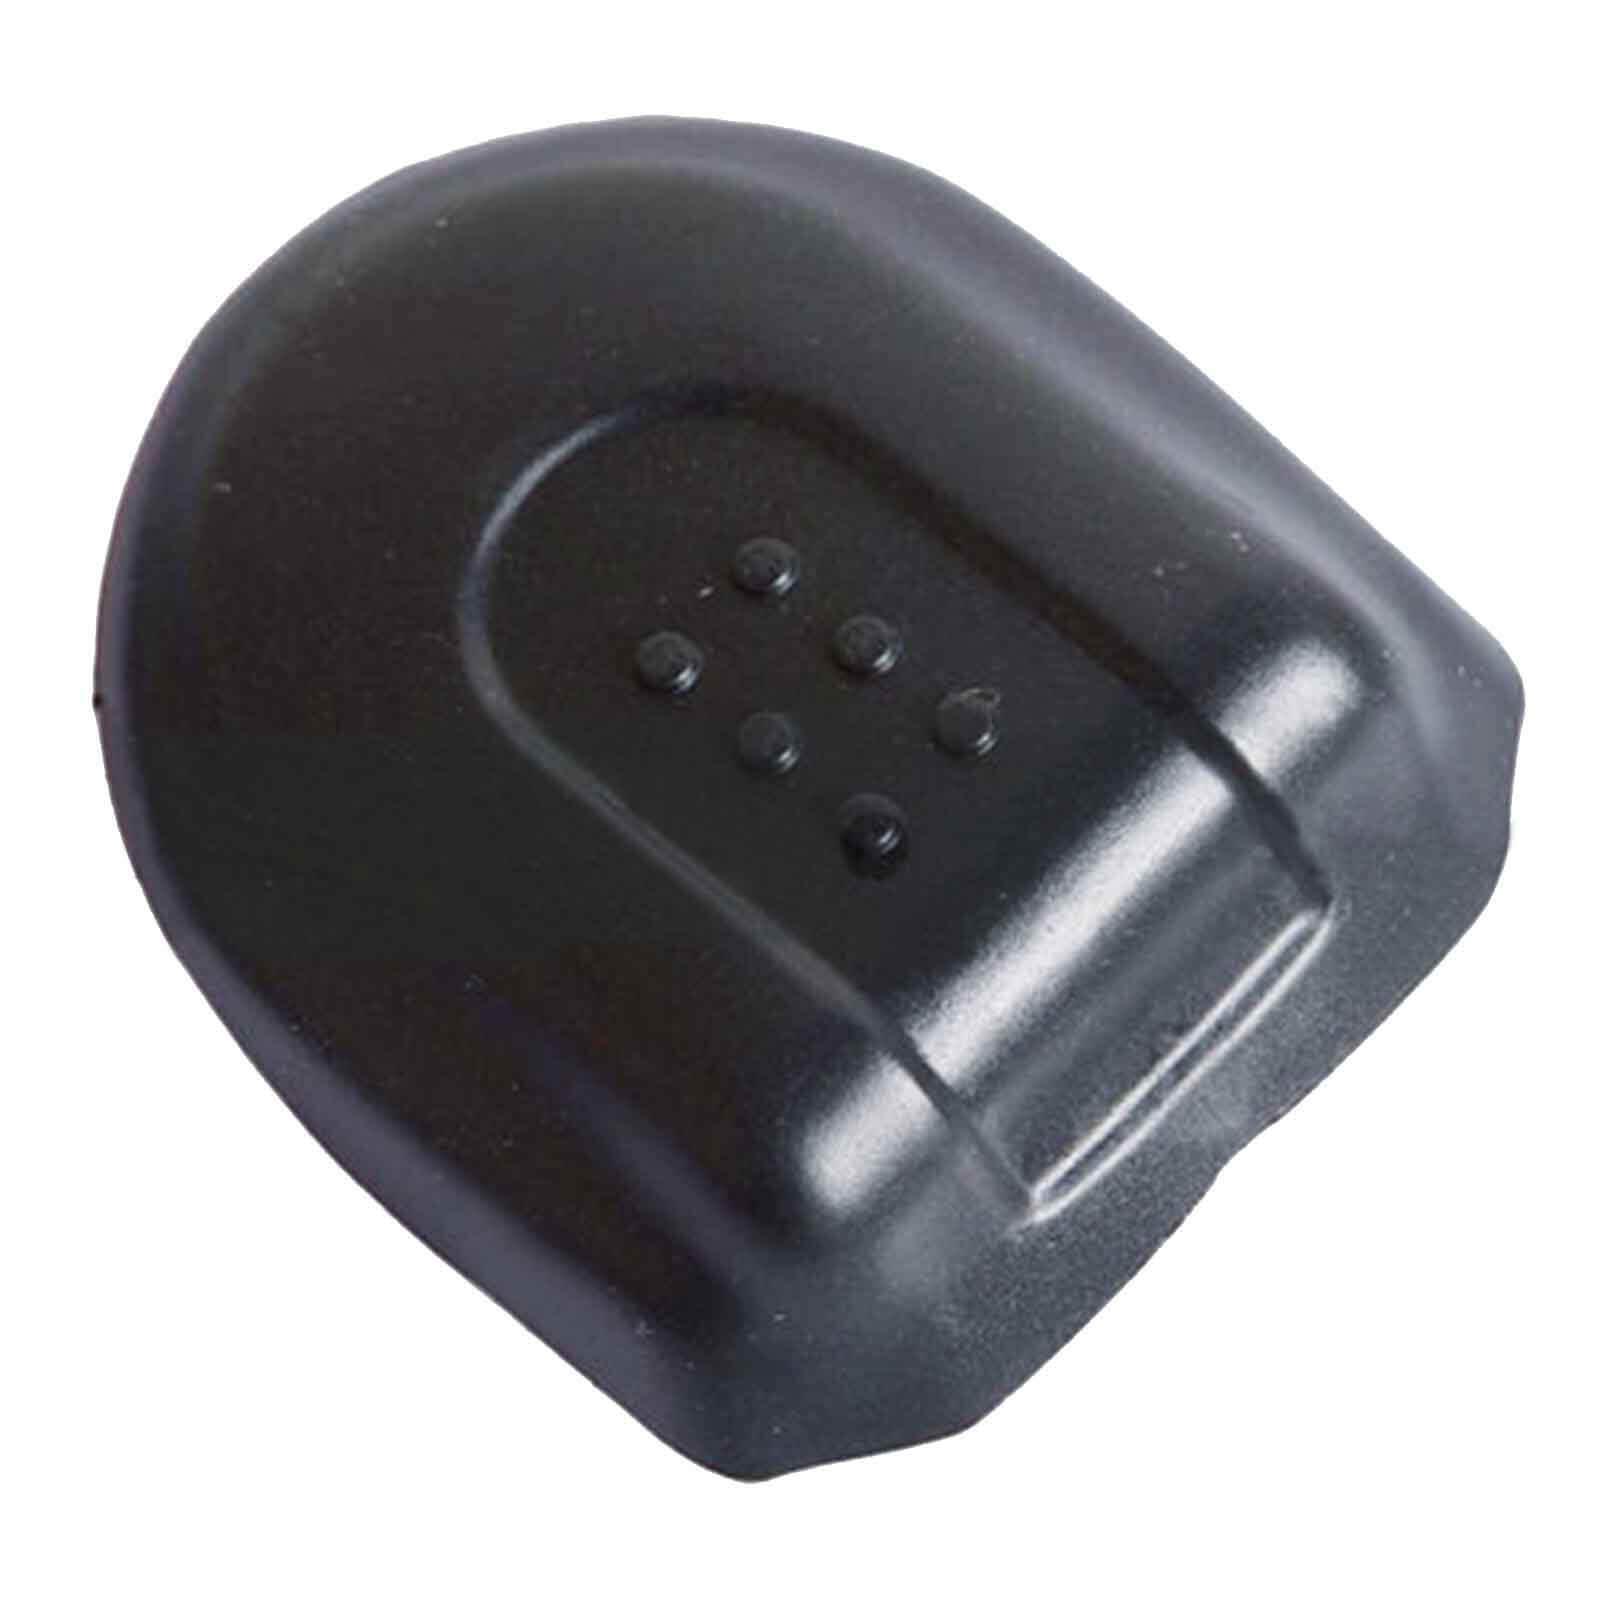 Hot Shoe Protector Cover/Cap BS-2 for Nikon Digital/Film SLR Camera—High Quality